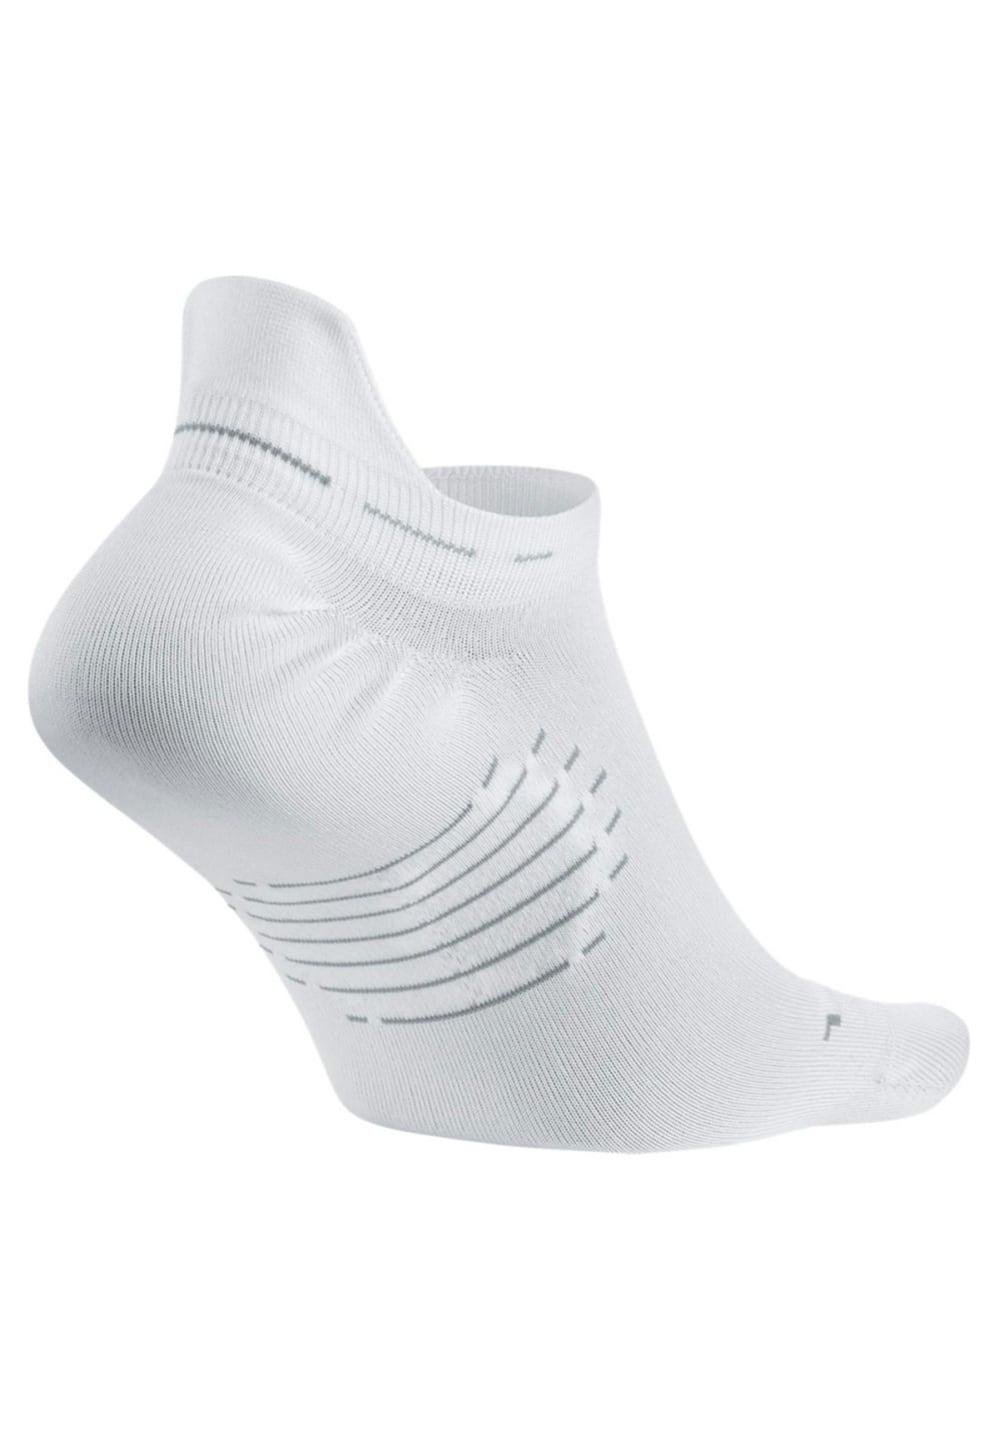 ade77127b2a03 Nike Elite Lightweight No-Show Tab - Running socks - White